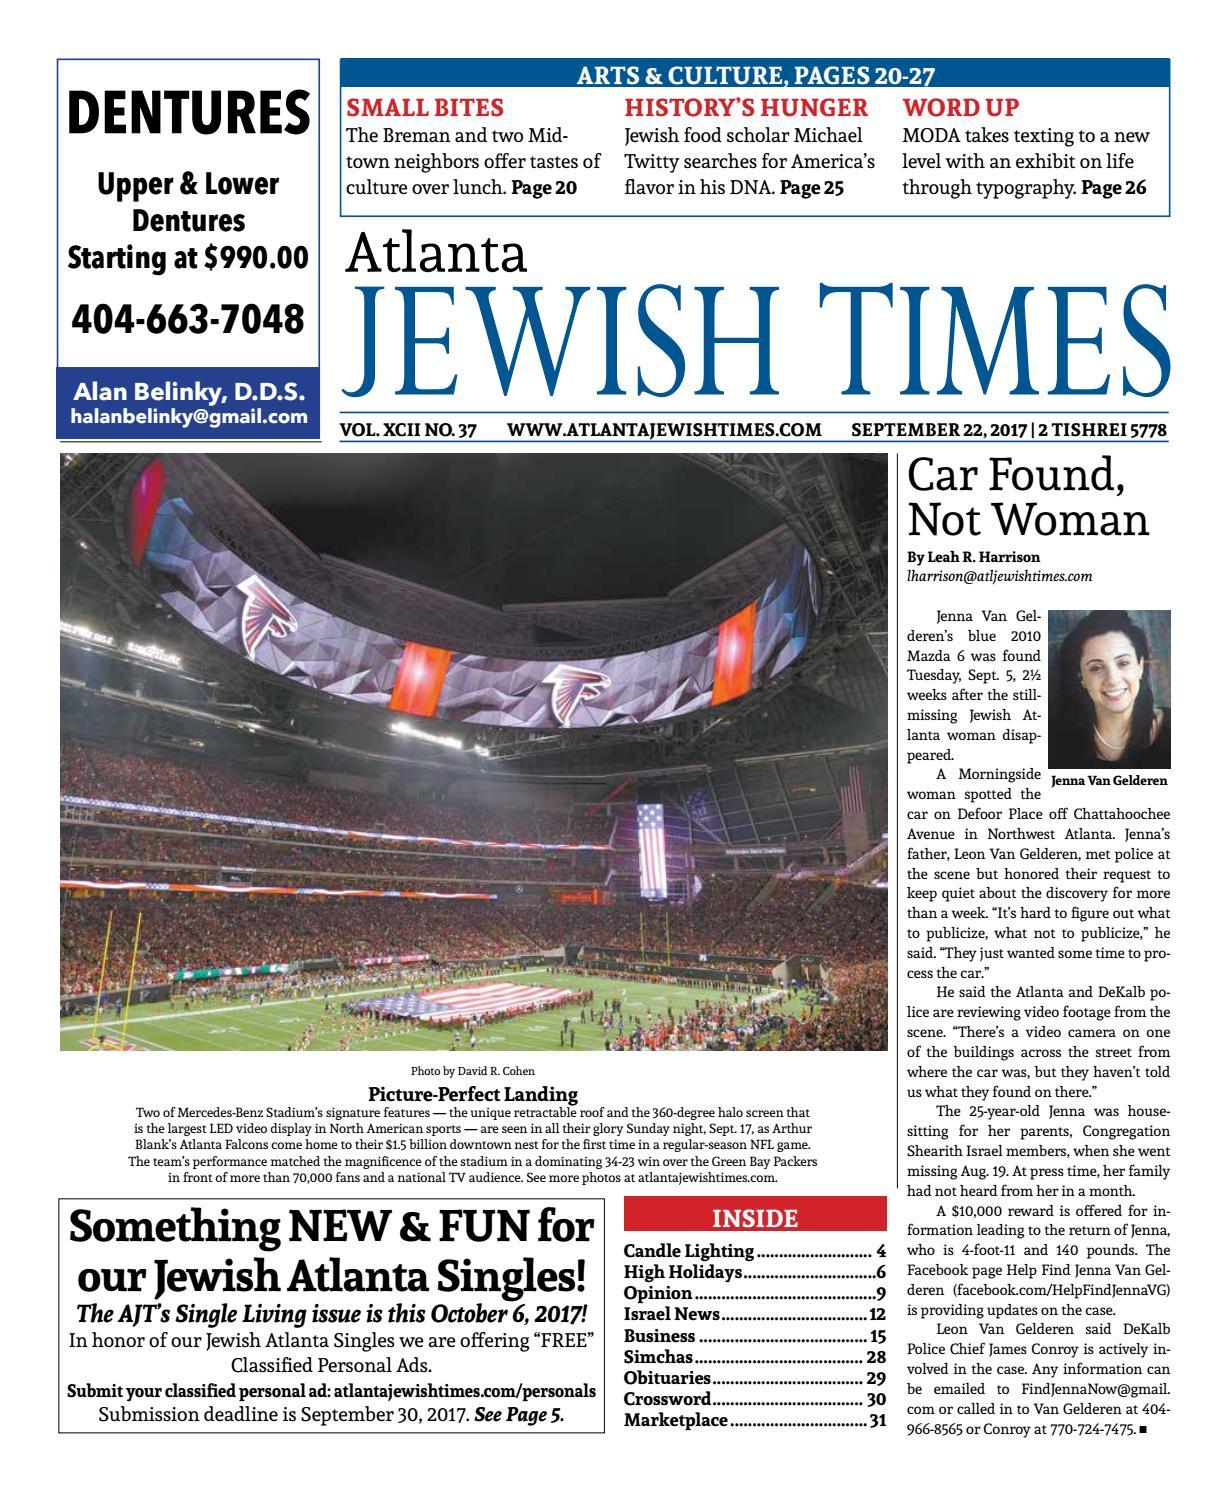 Atlanta Jewish Times, Vol  XCII No  37, September 22, 2017